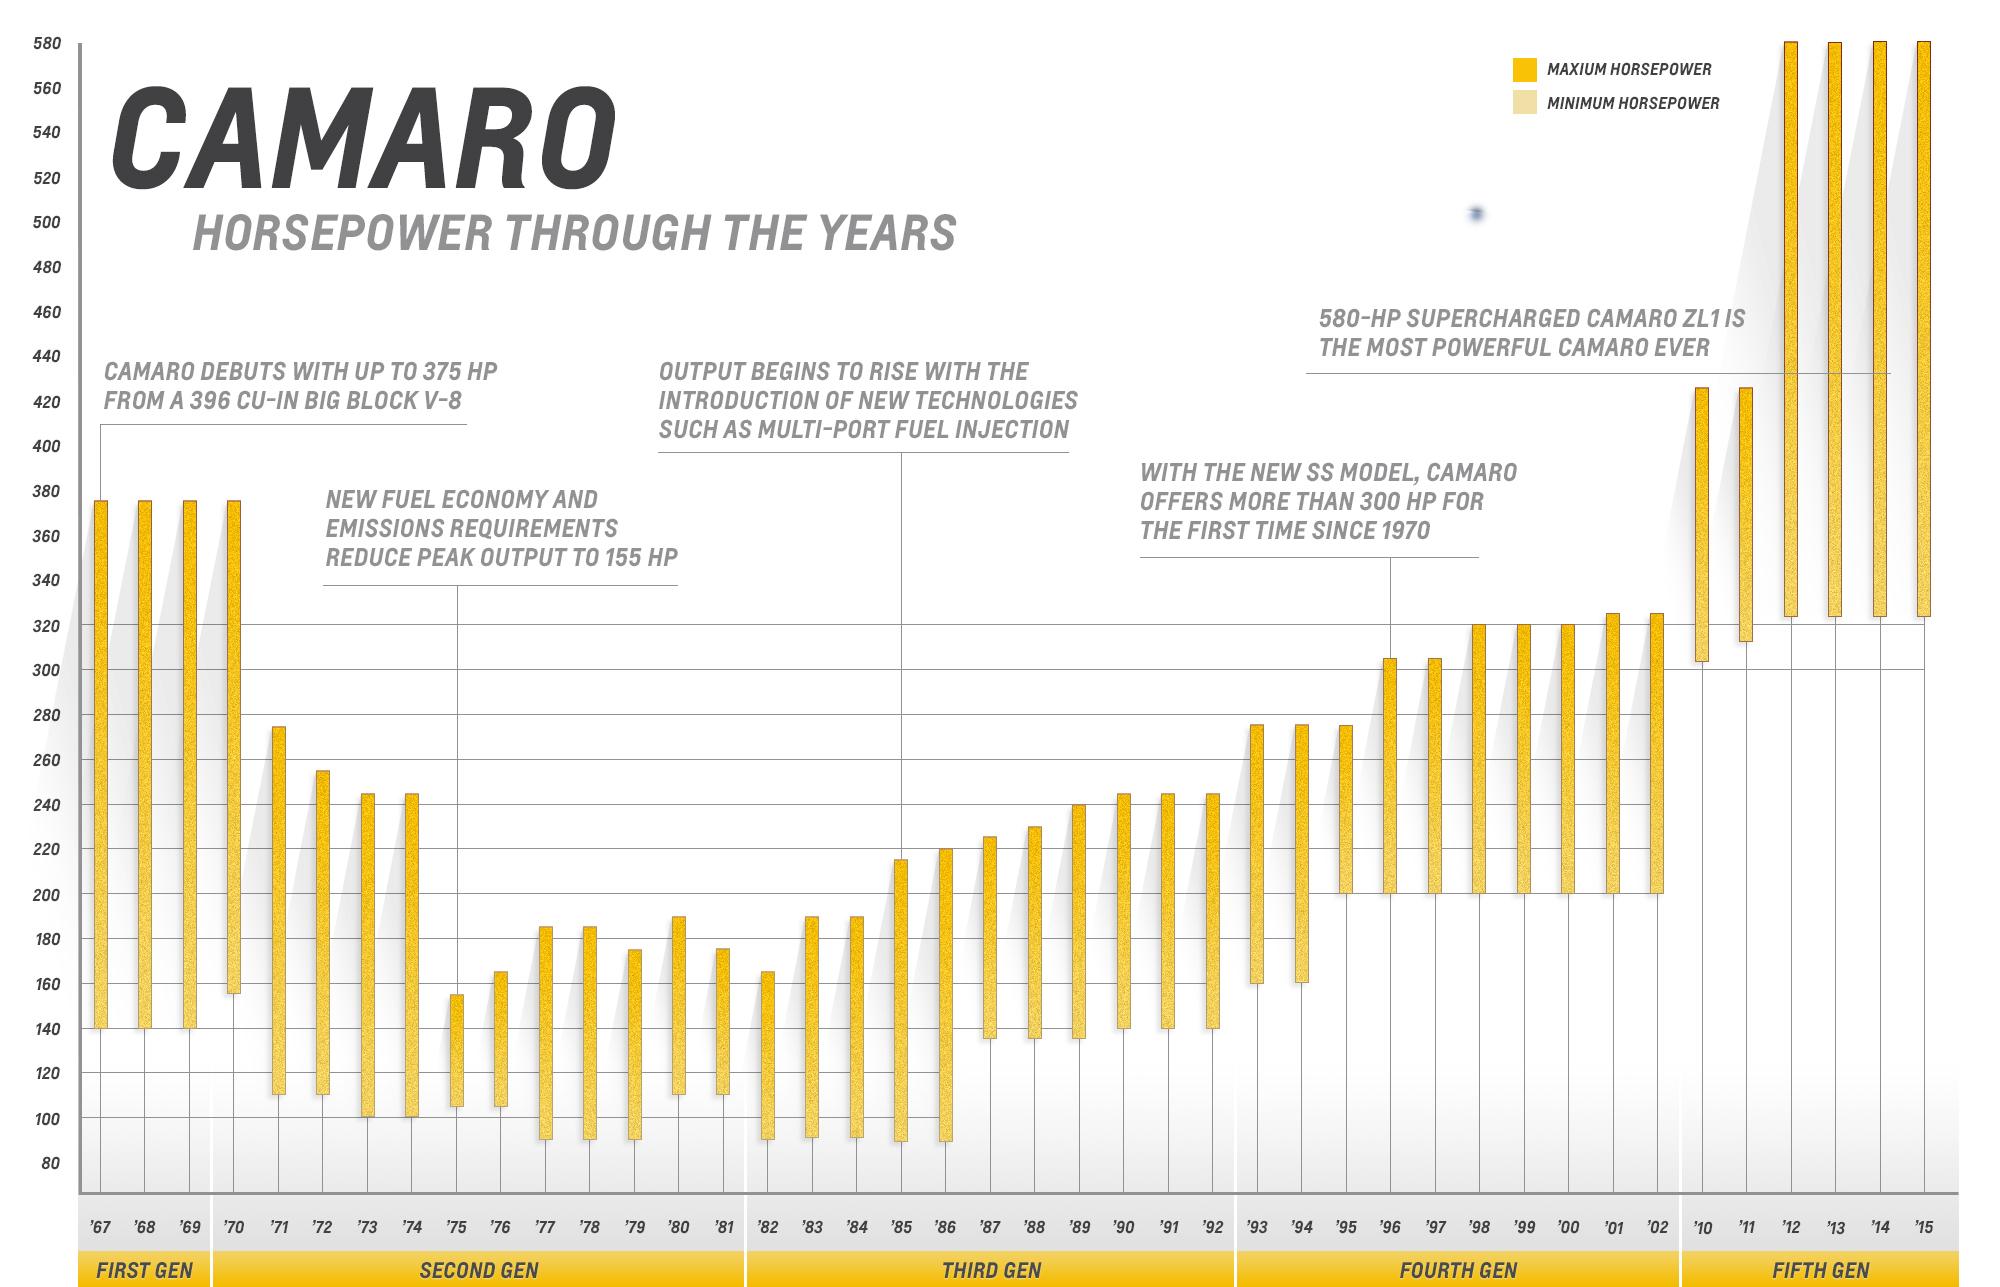 Power Play Camaro Engines through the Years